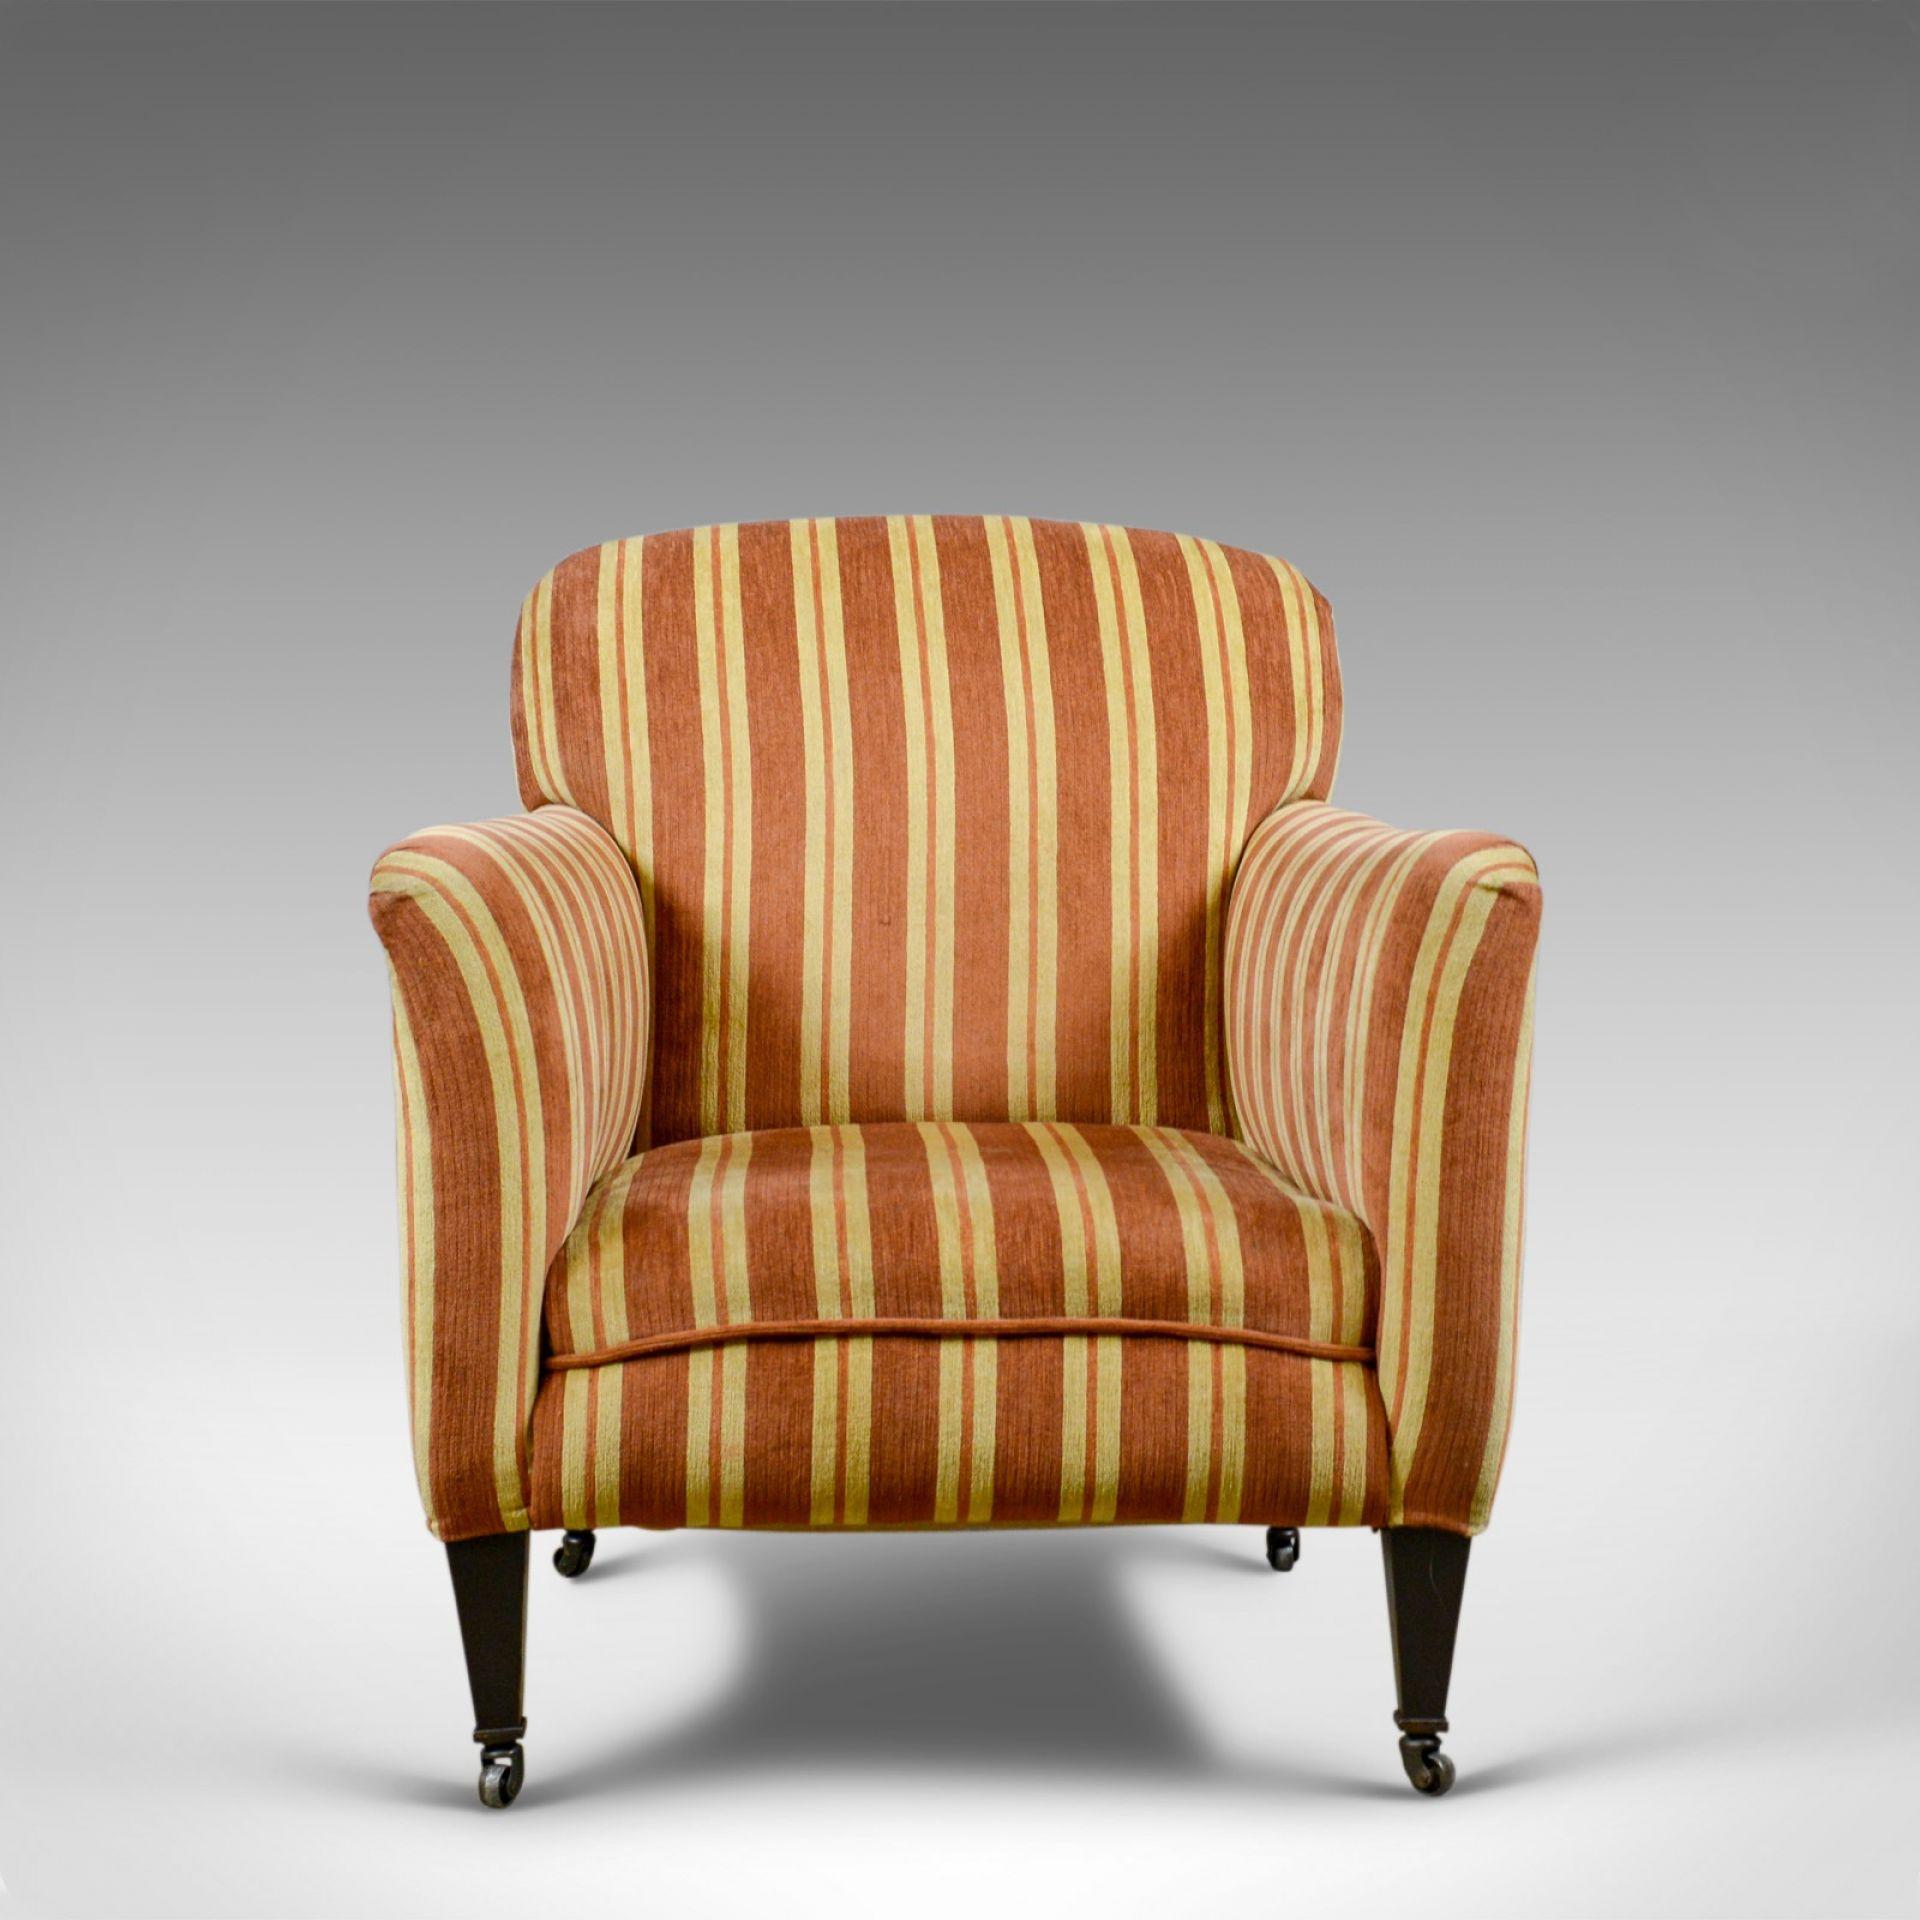 Antique Armchair, English, Edwardian Club Chair, Early 20th Century, Circa 1910